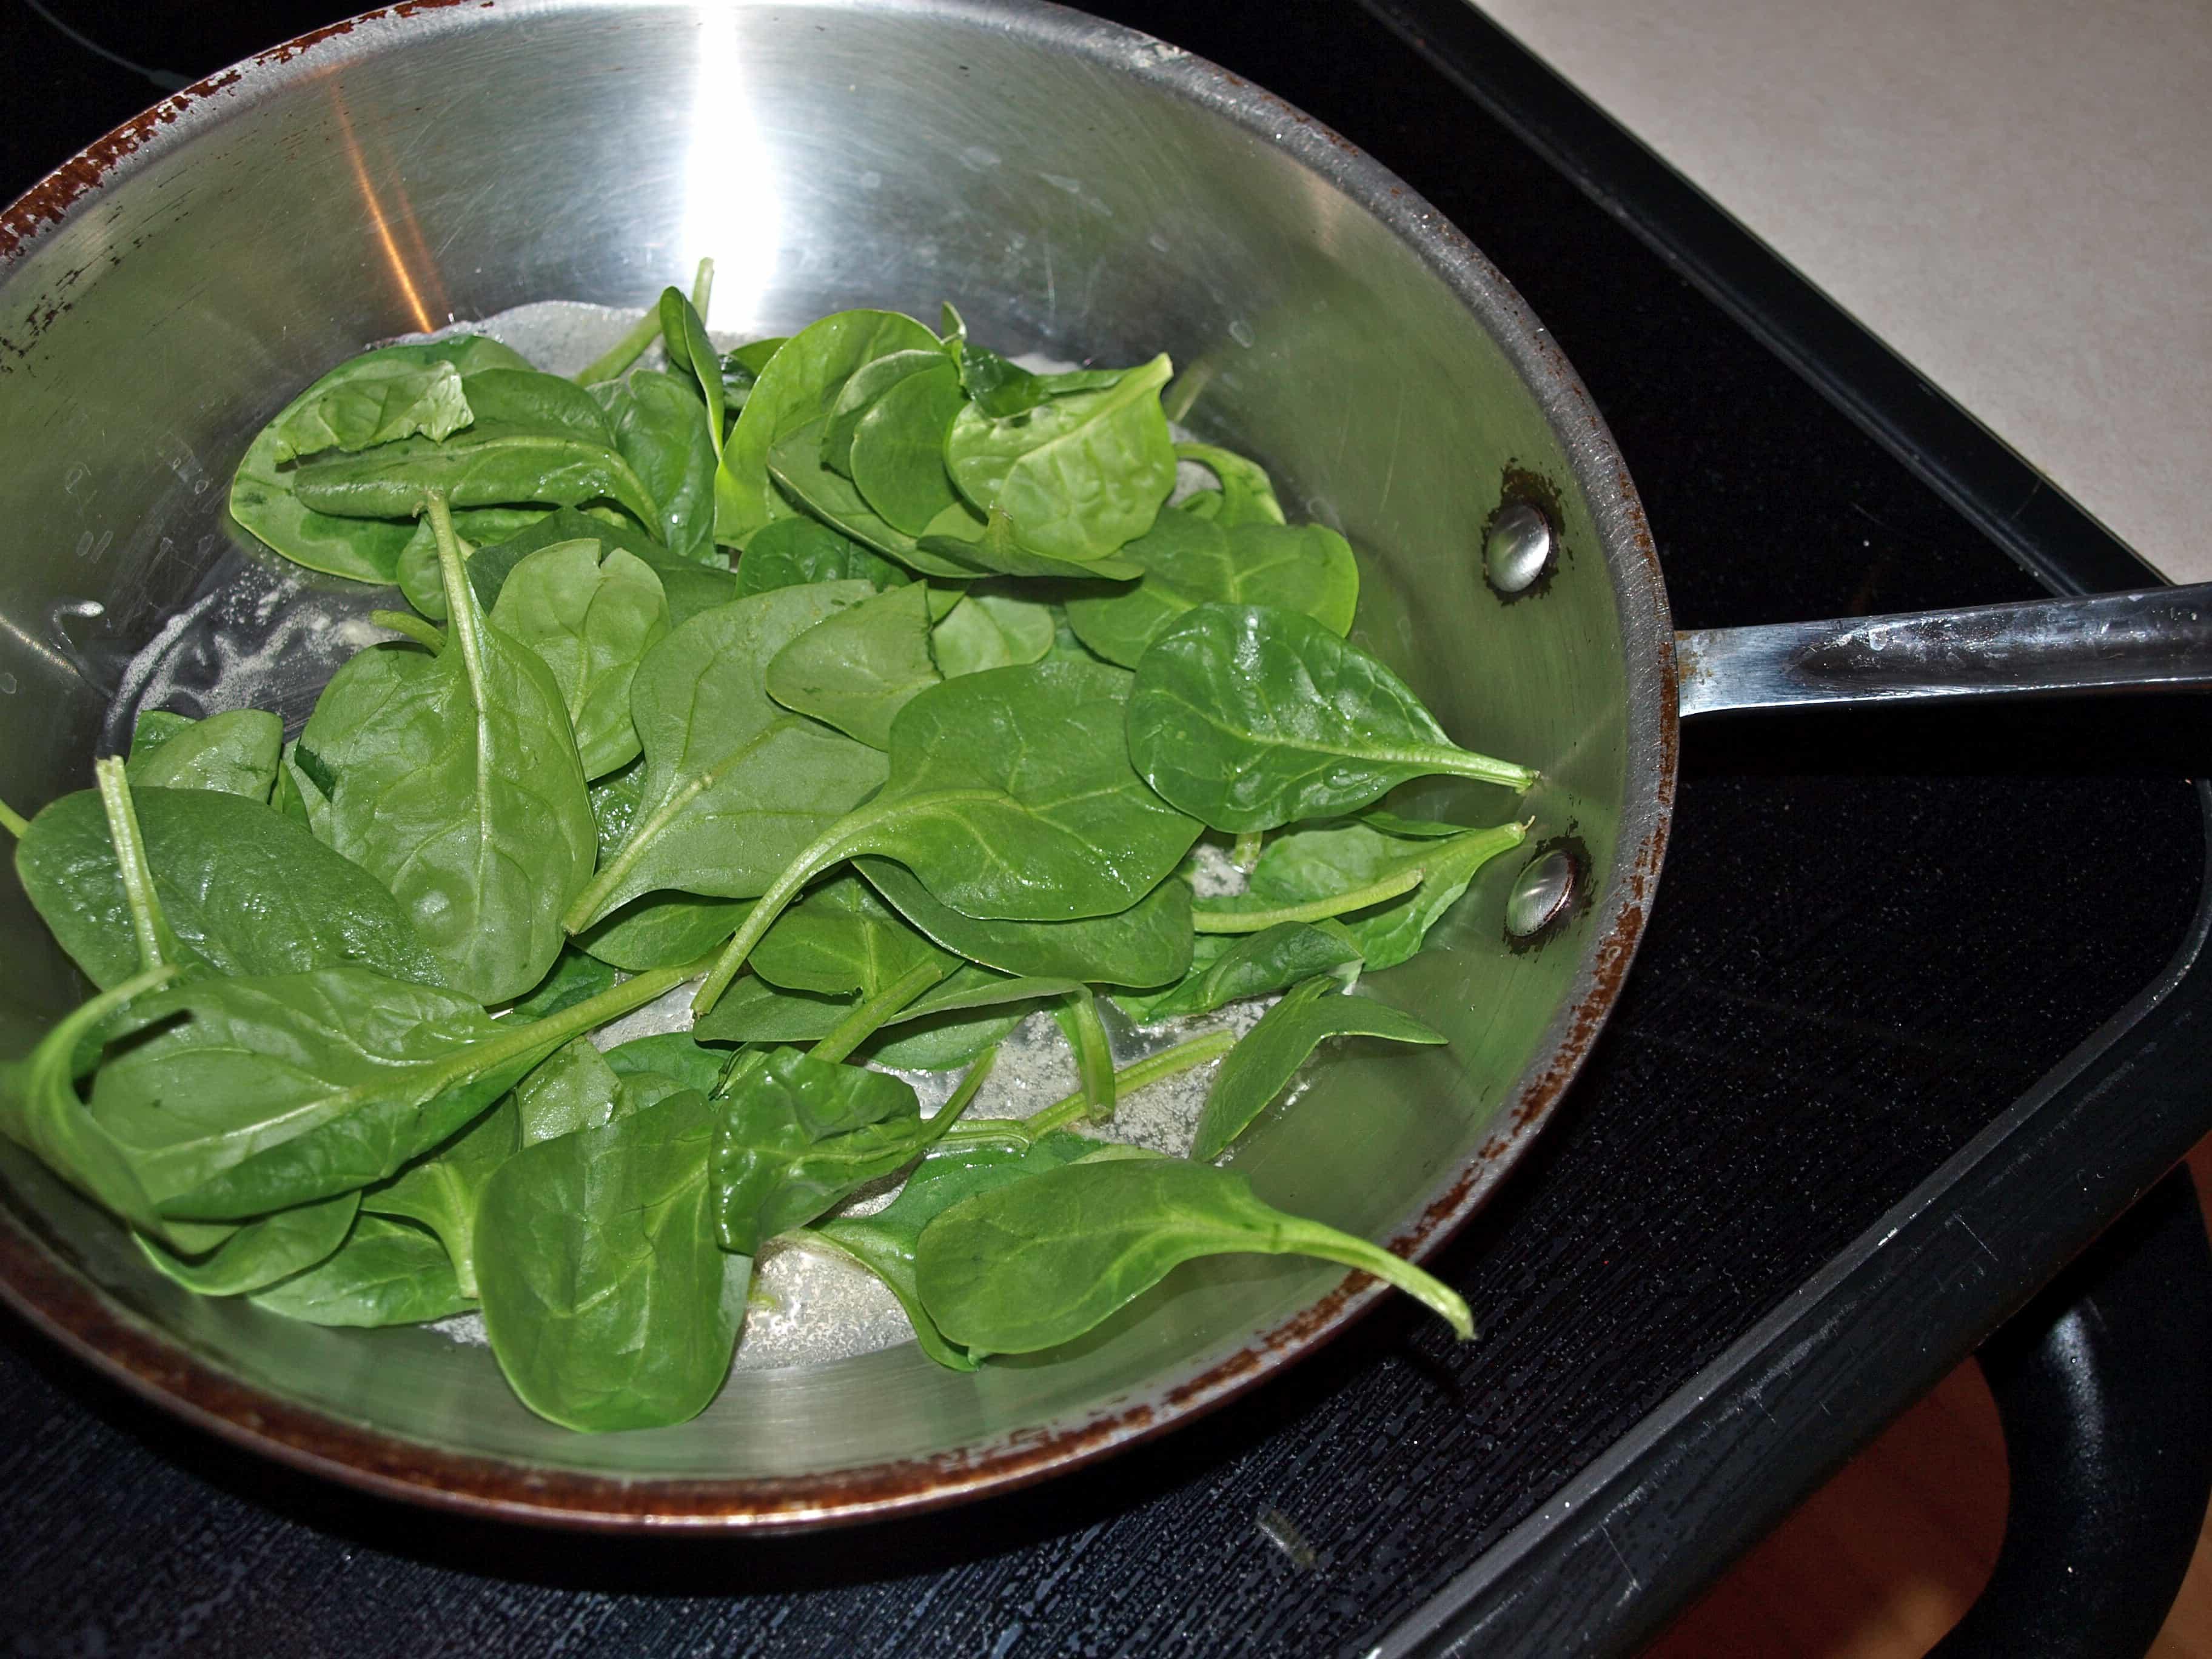 Hot Lunch in a Hurry:  Spinach-Artichoke Panini